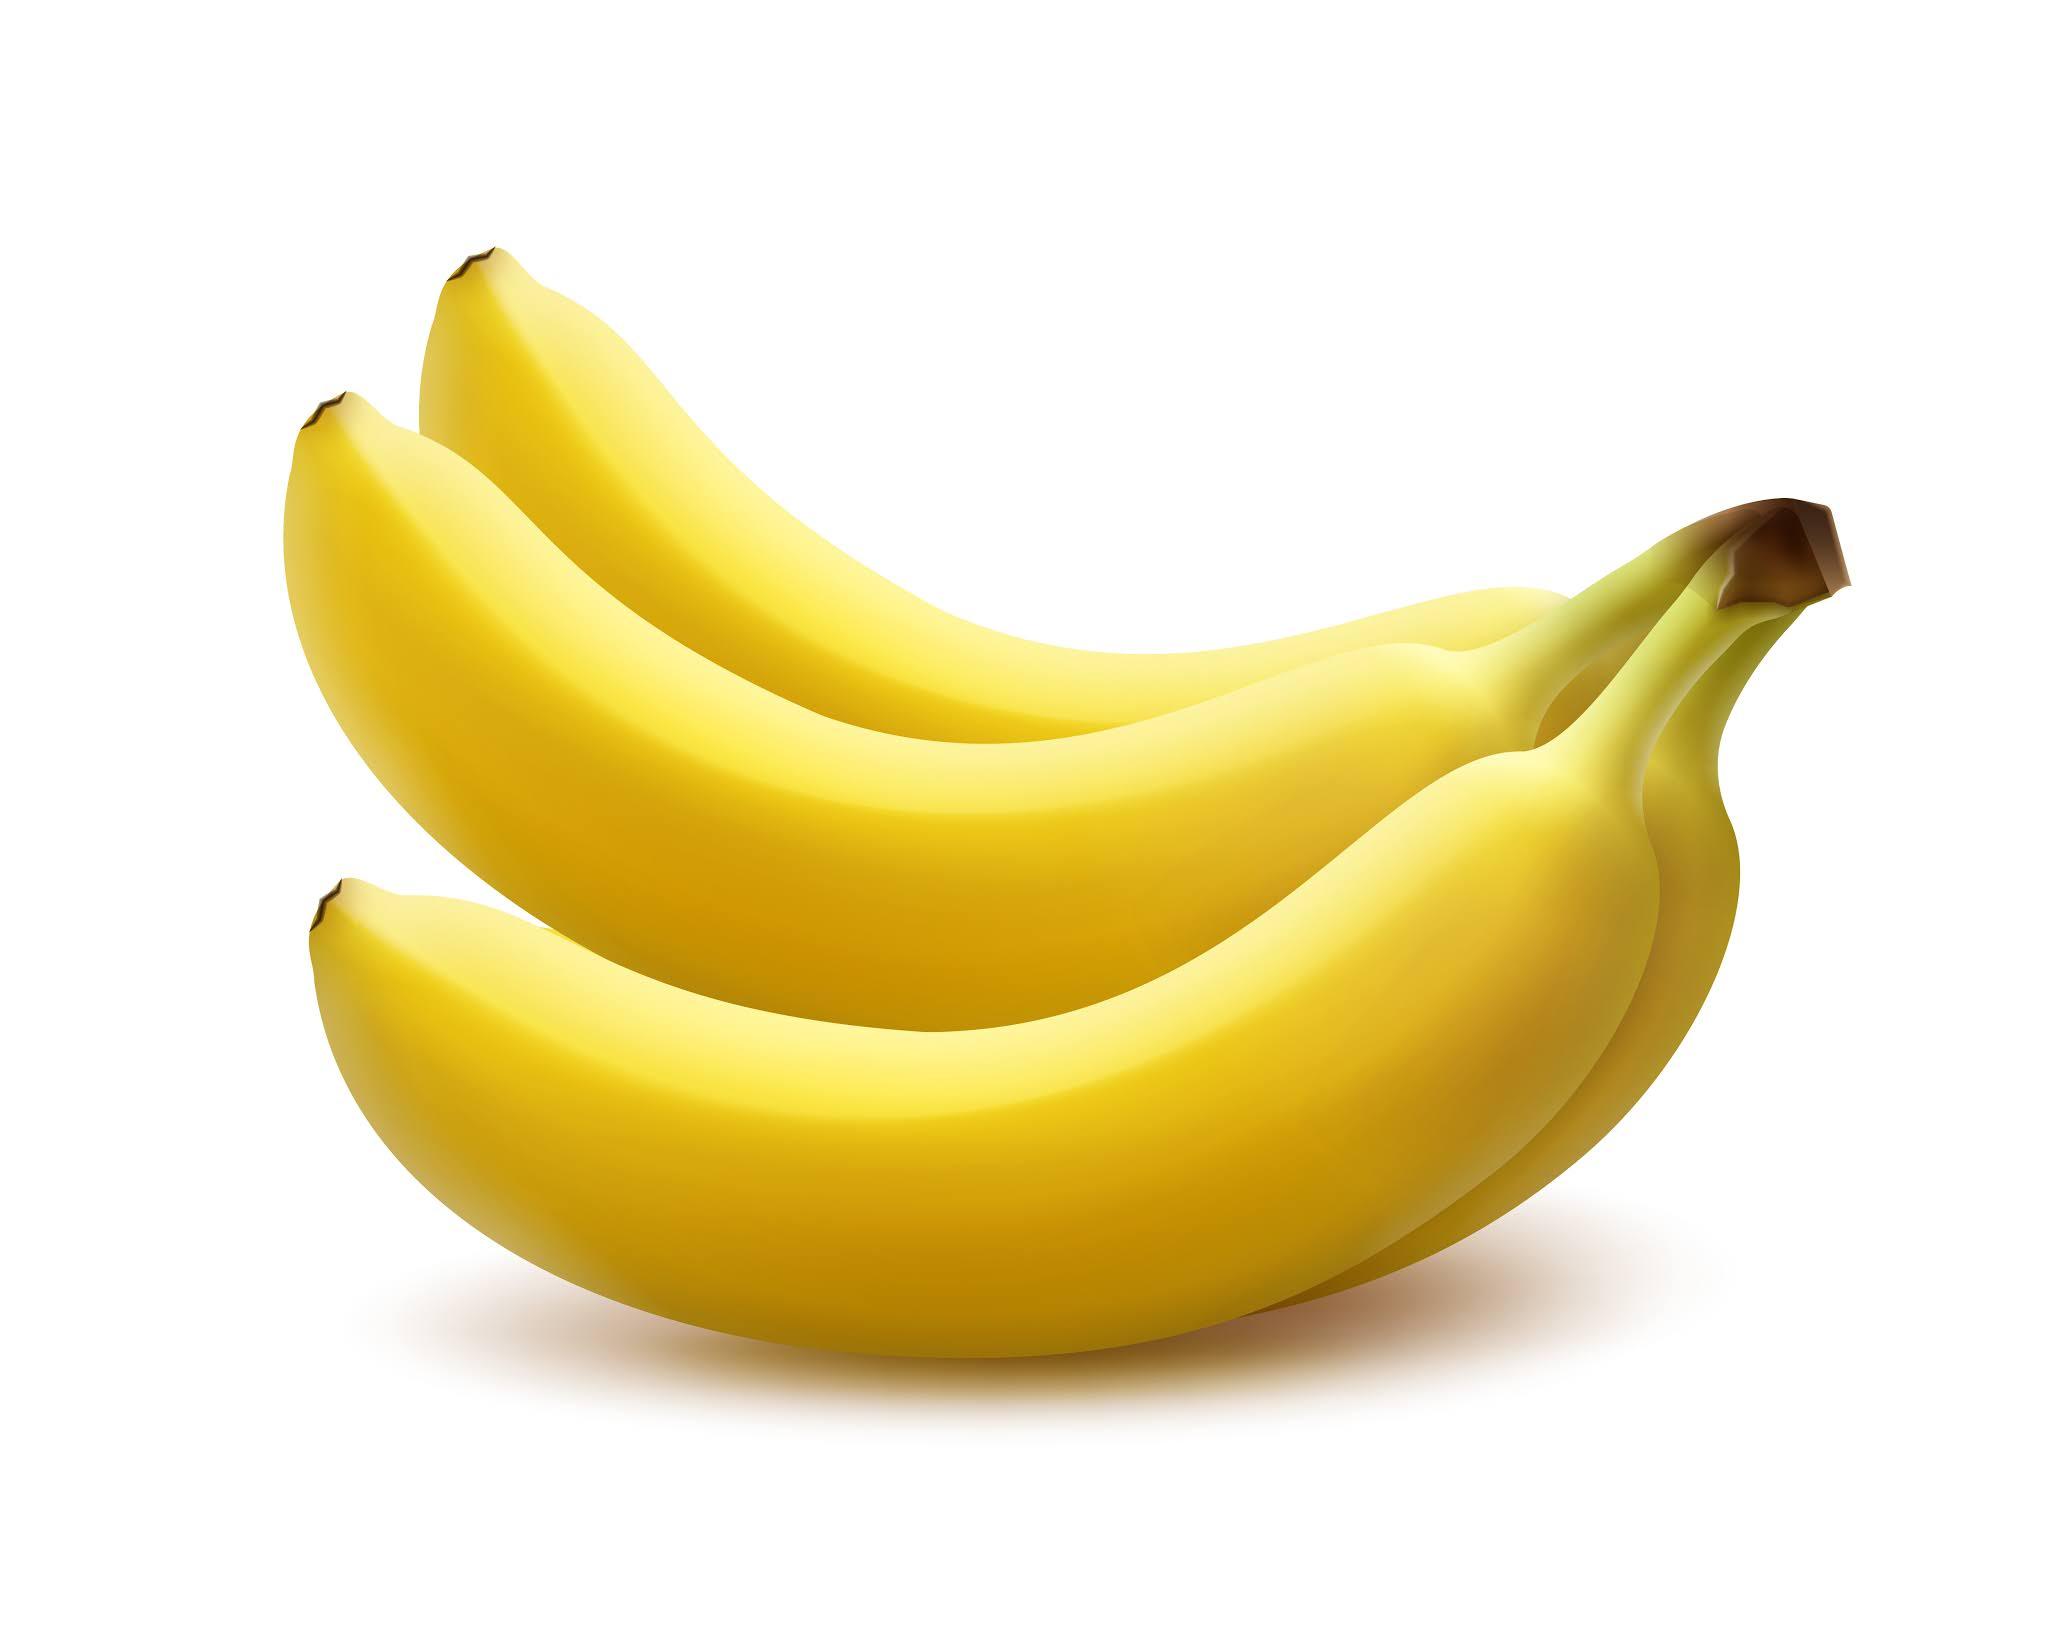 5 Incredible Uses for Banana Peels